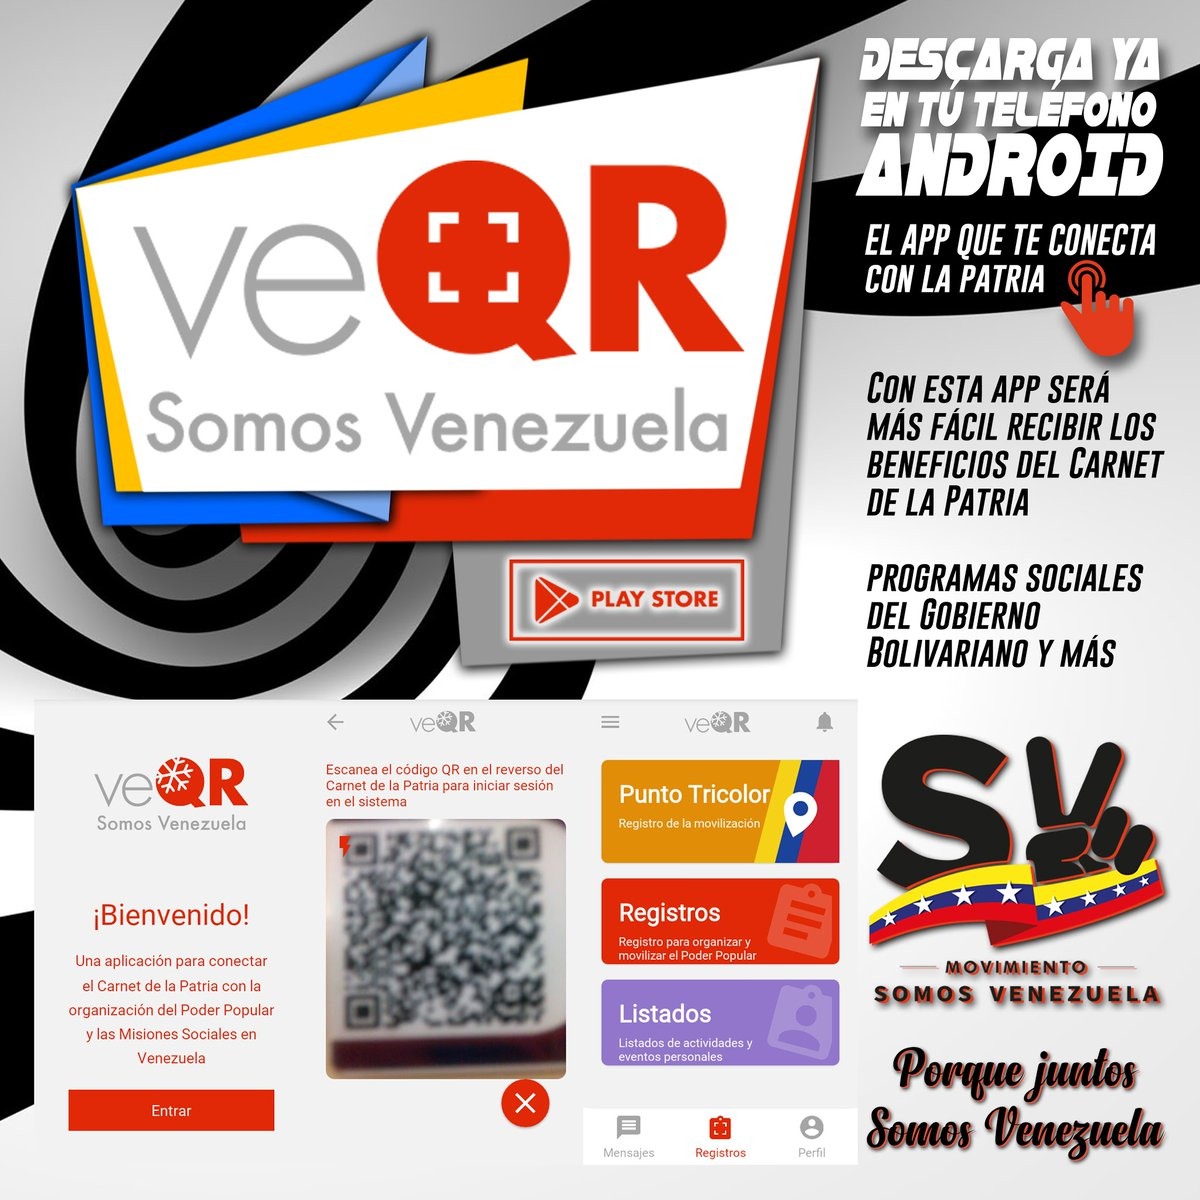 descargar veqr somos venezuela play store